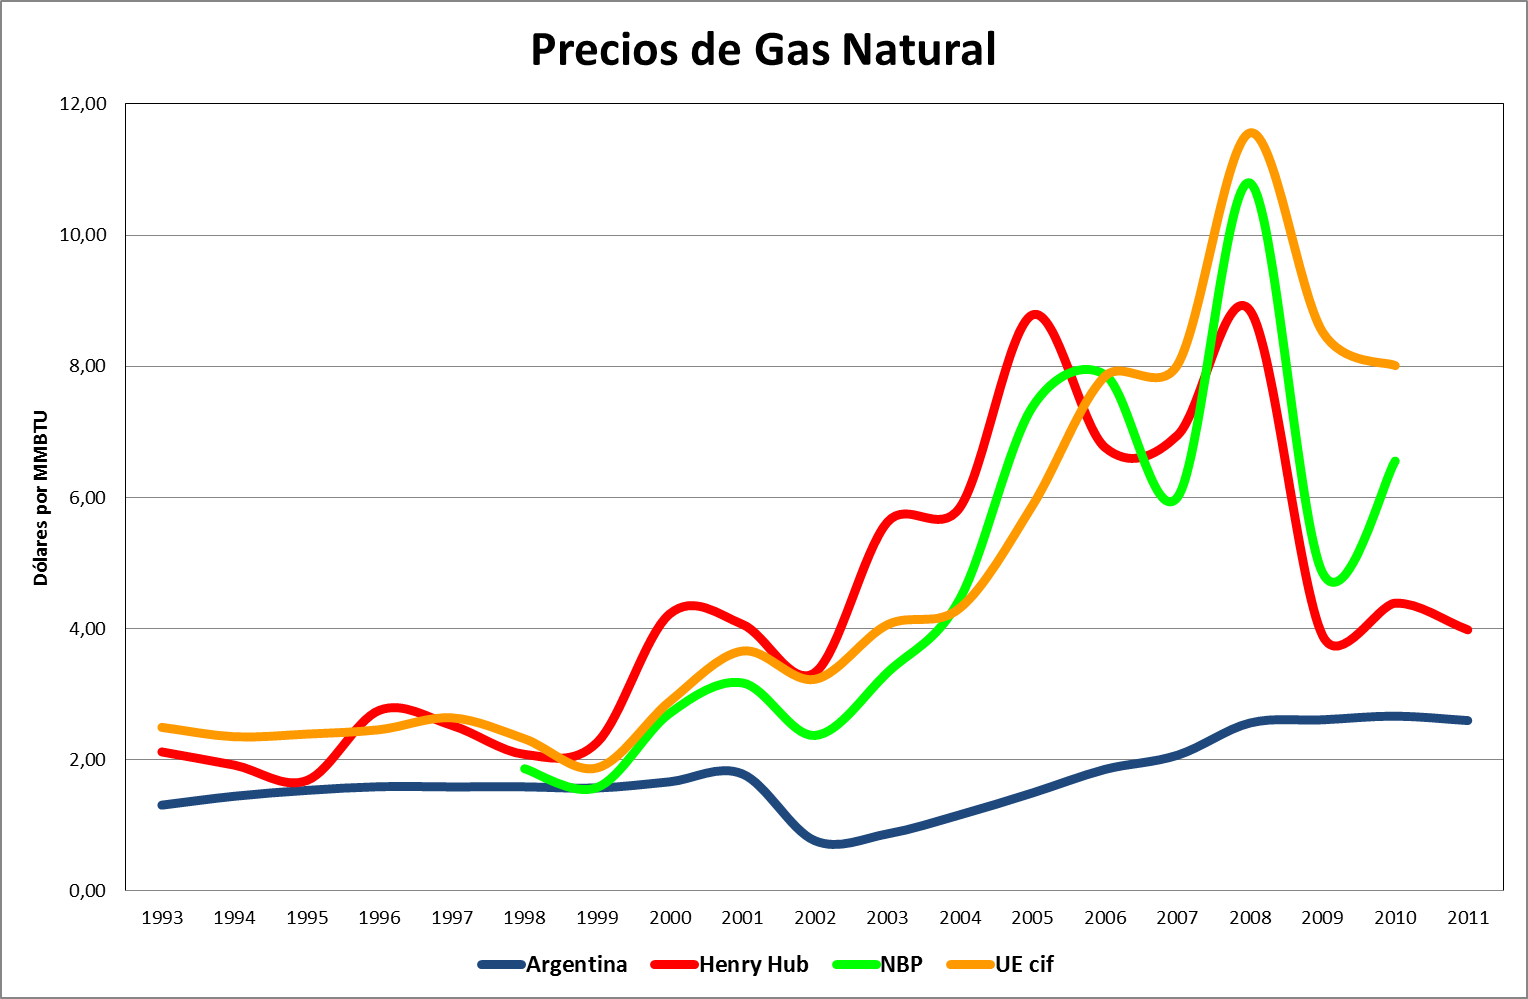 Calderas gas natural precios finest montaje central - Calderas de gas precios ...